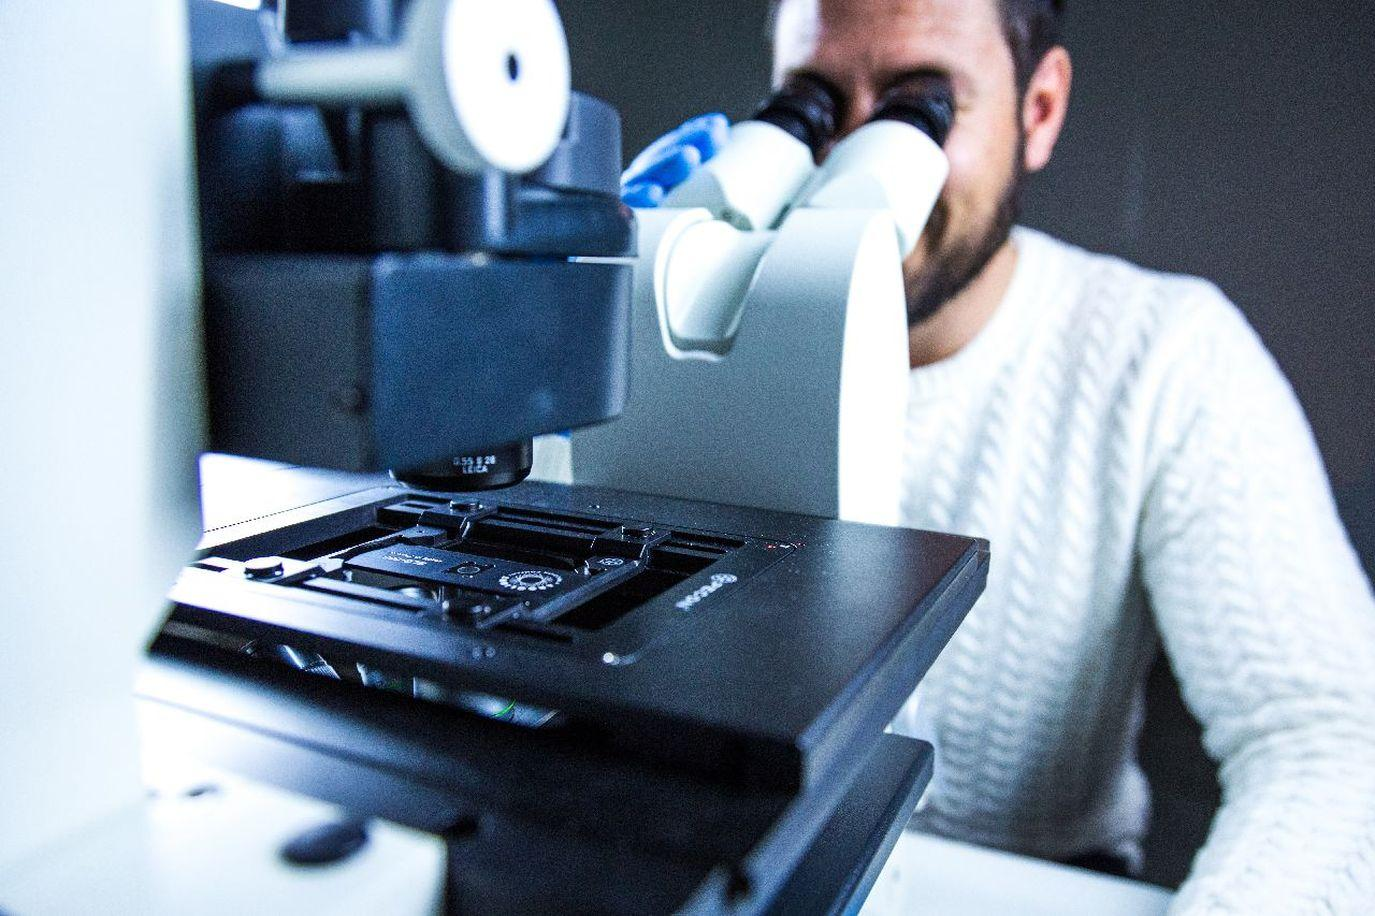 Figure 5: Fluorescence microscopy quality checks using an Argolight slide